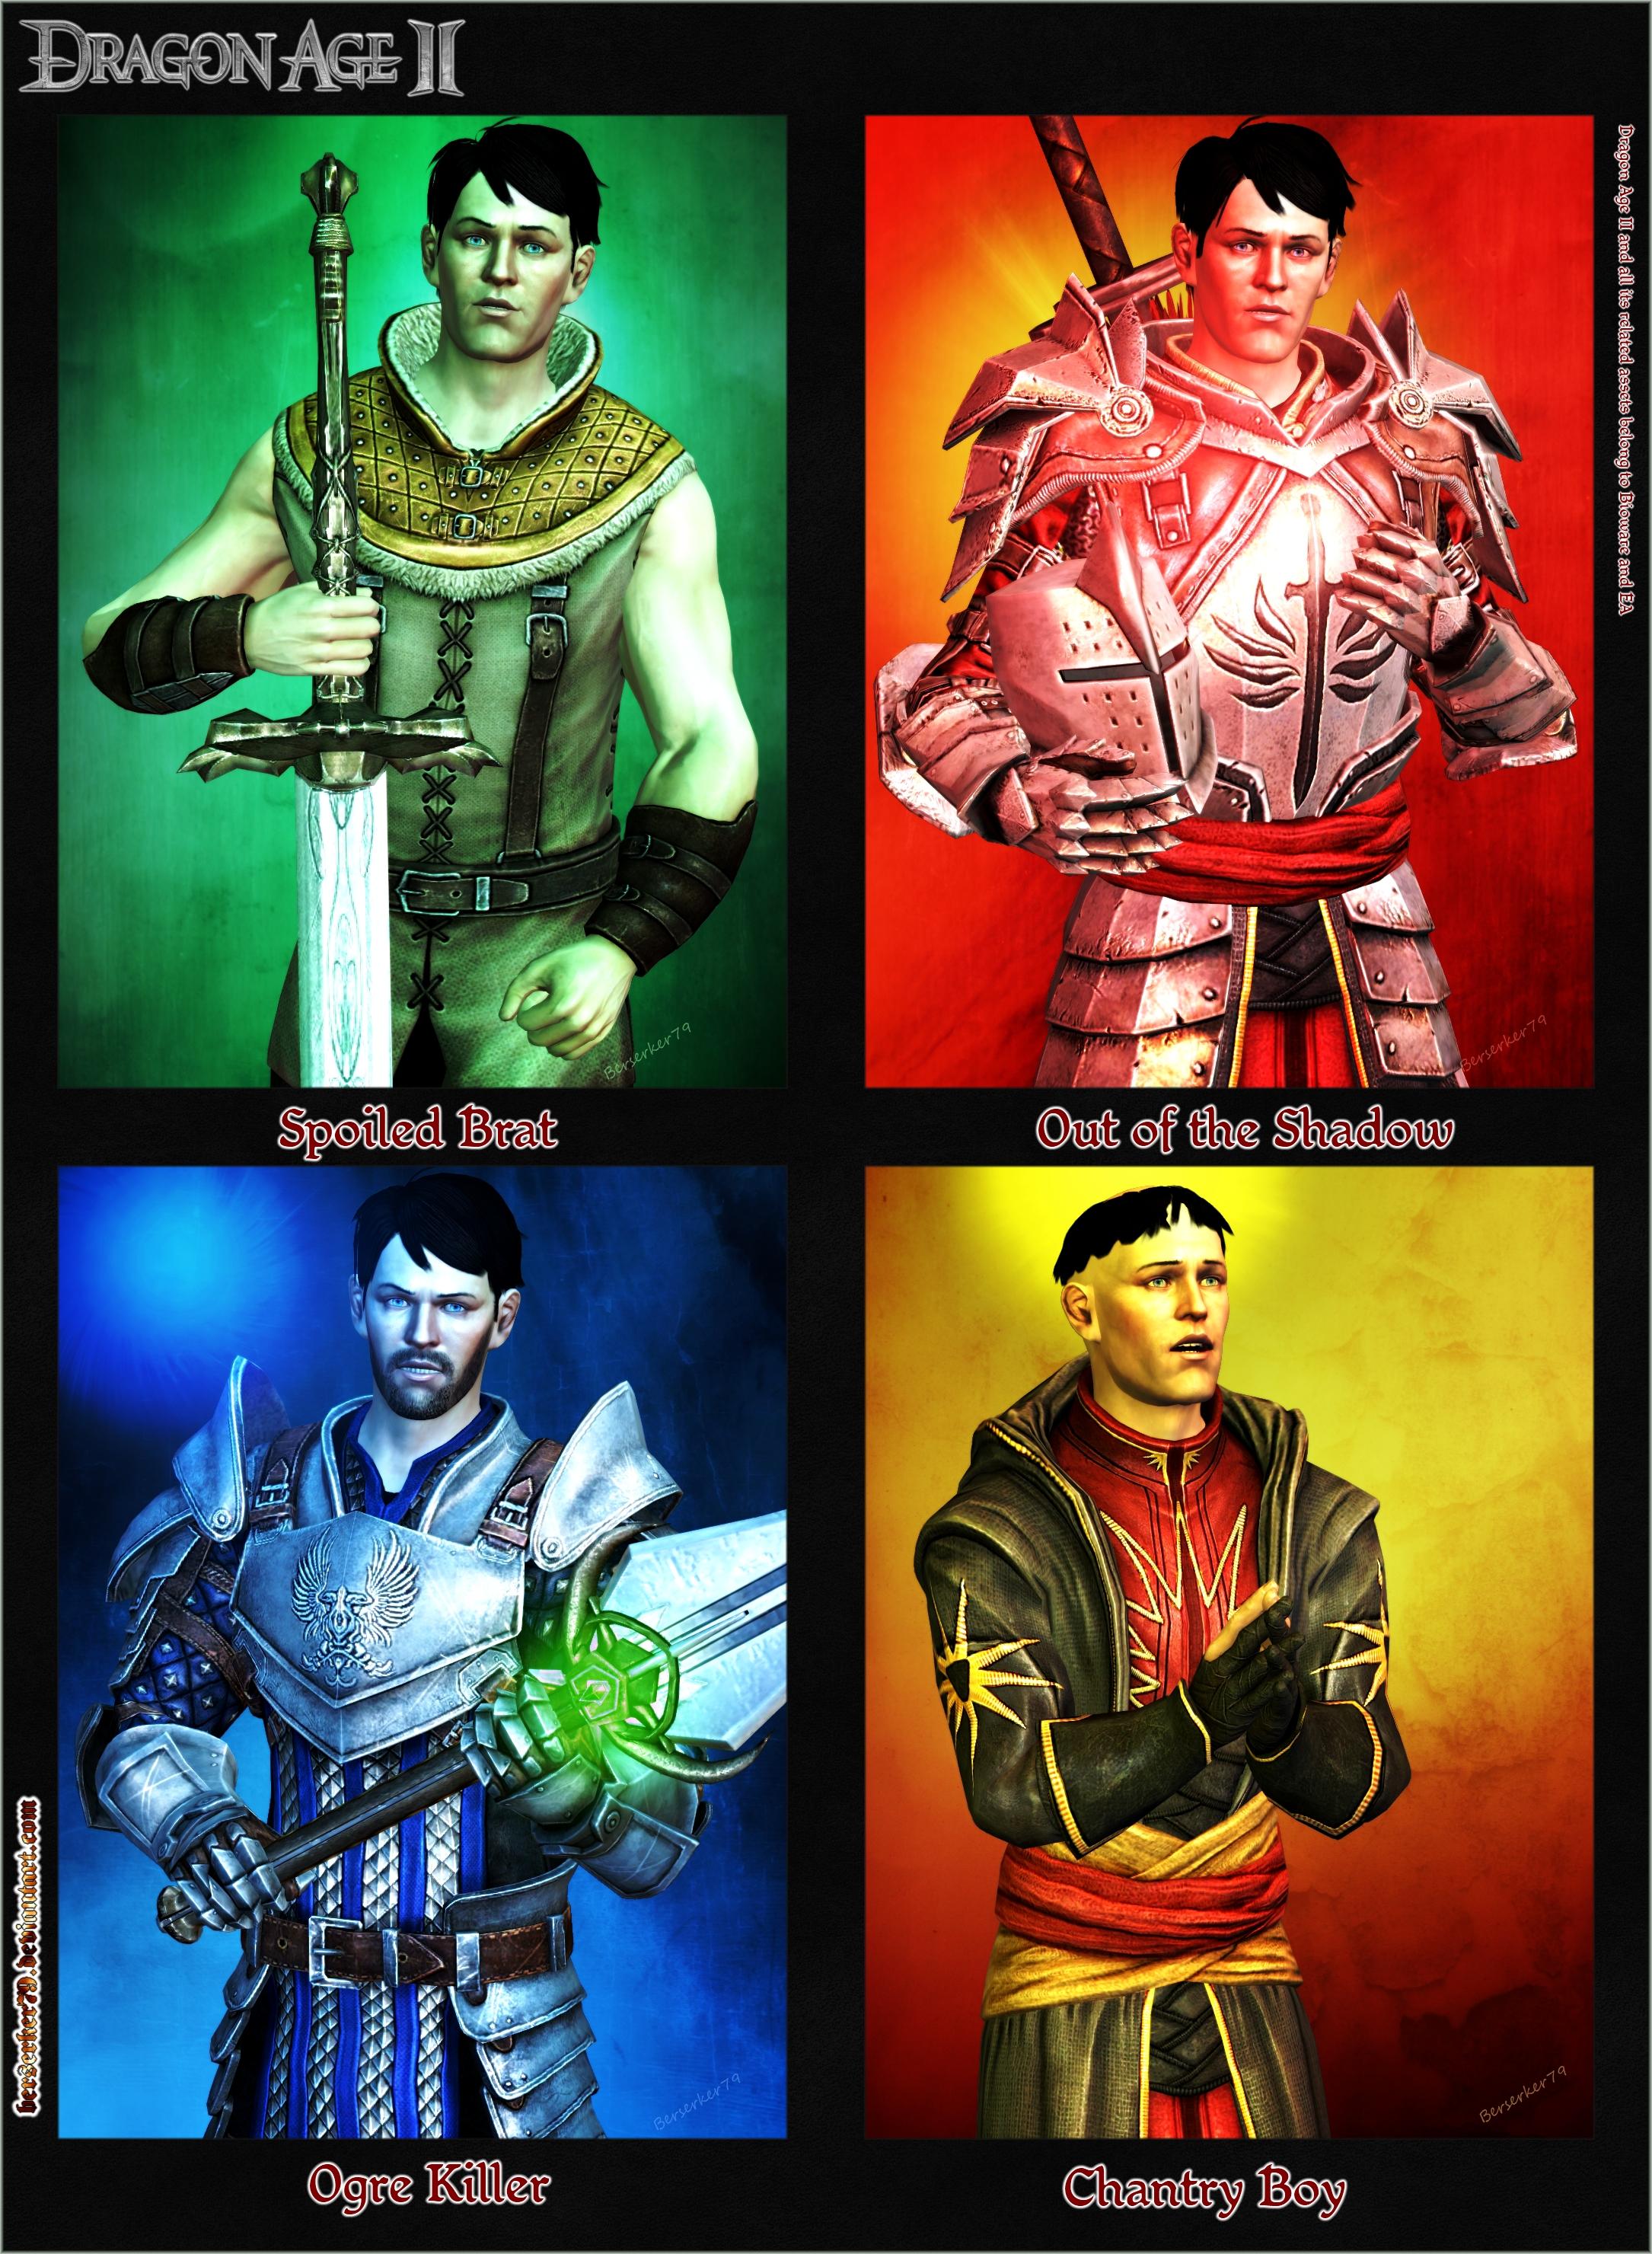 Dragon Age II: I Make My Own Destiny by Berserker79